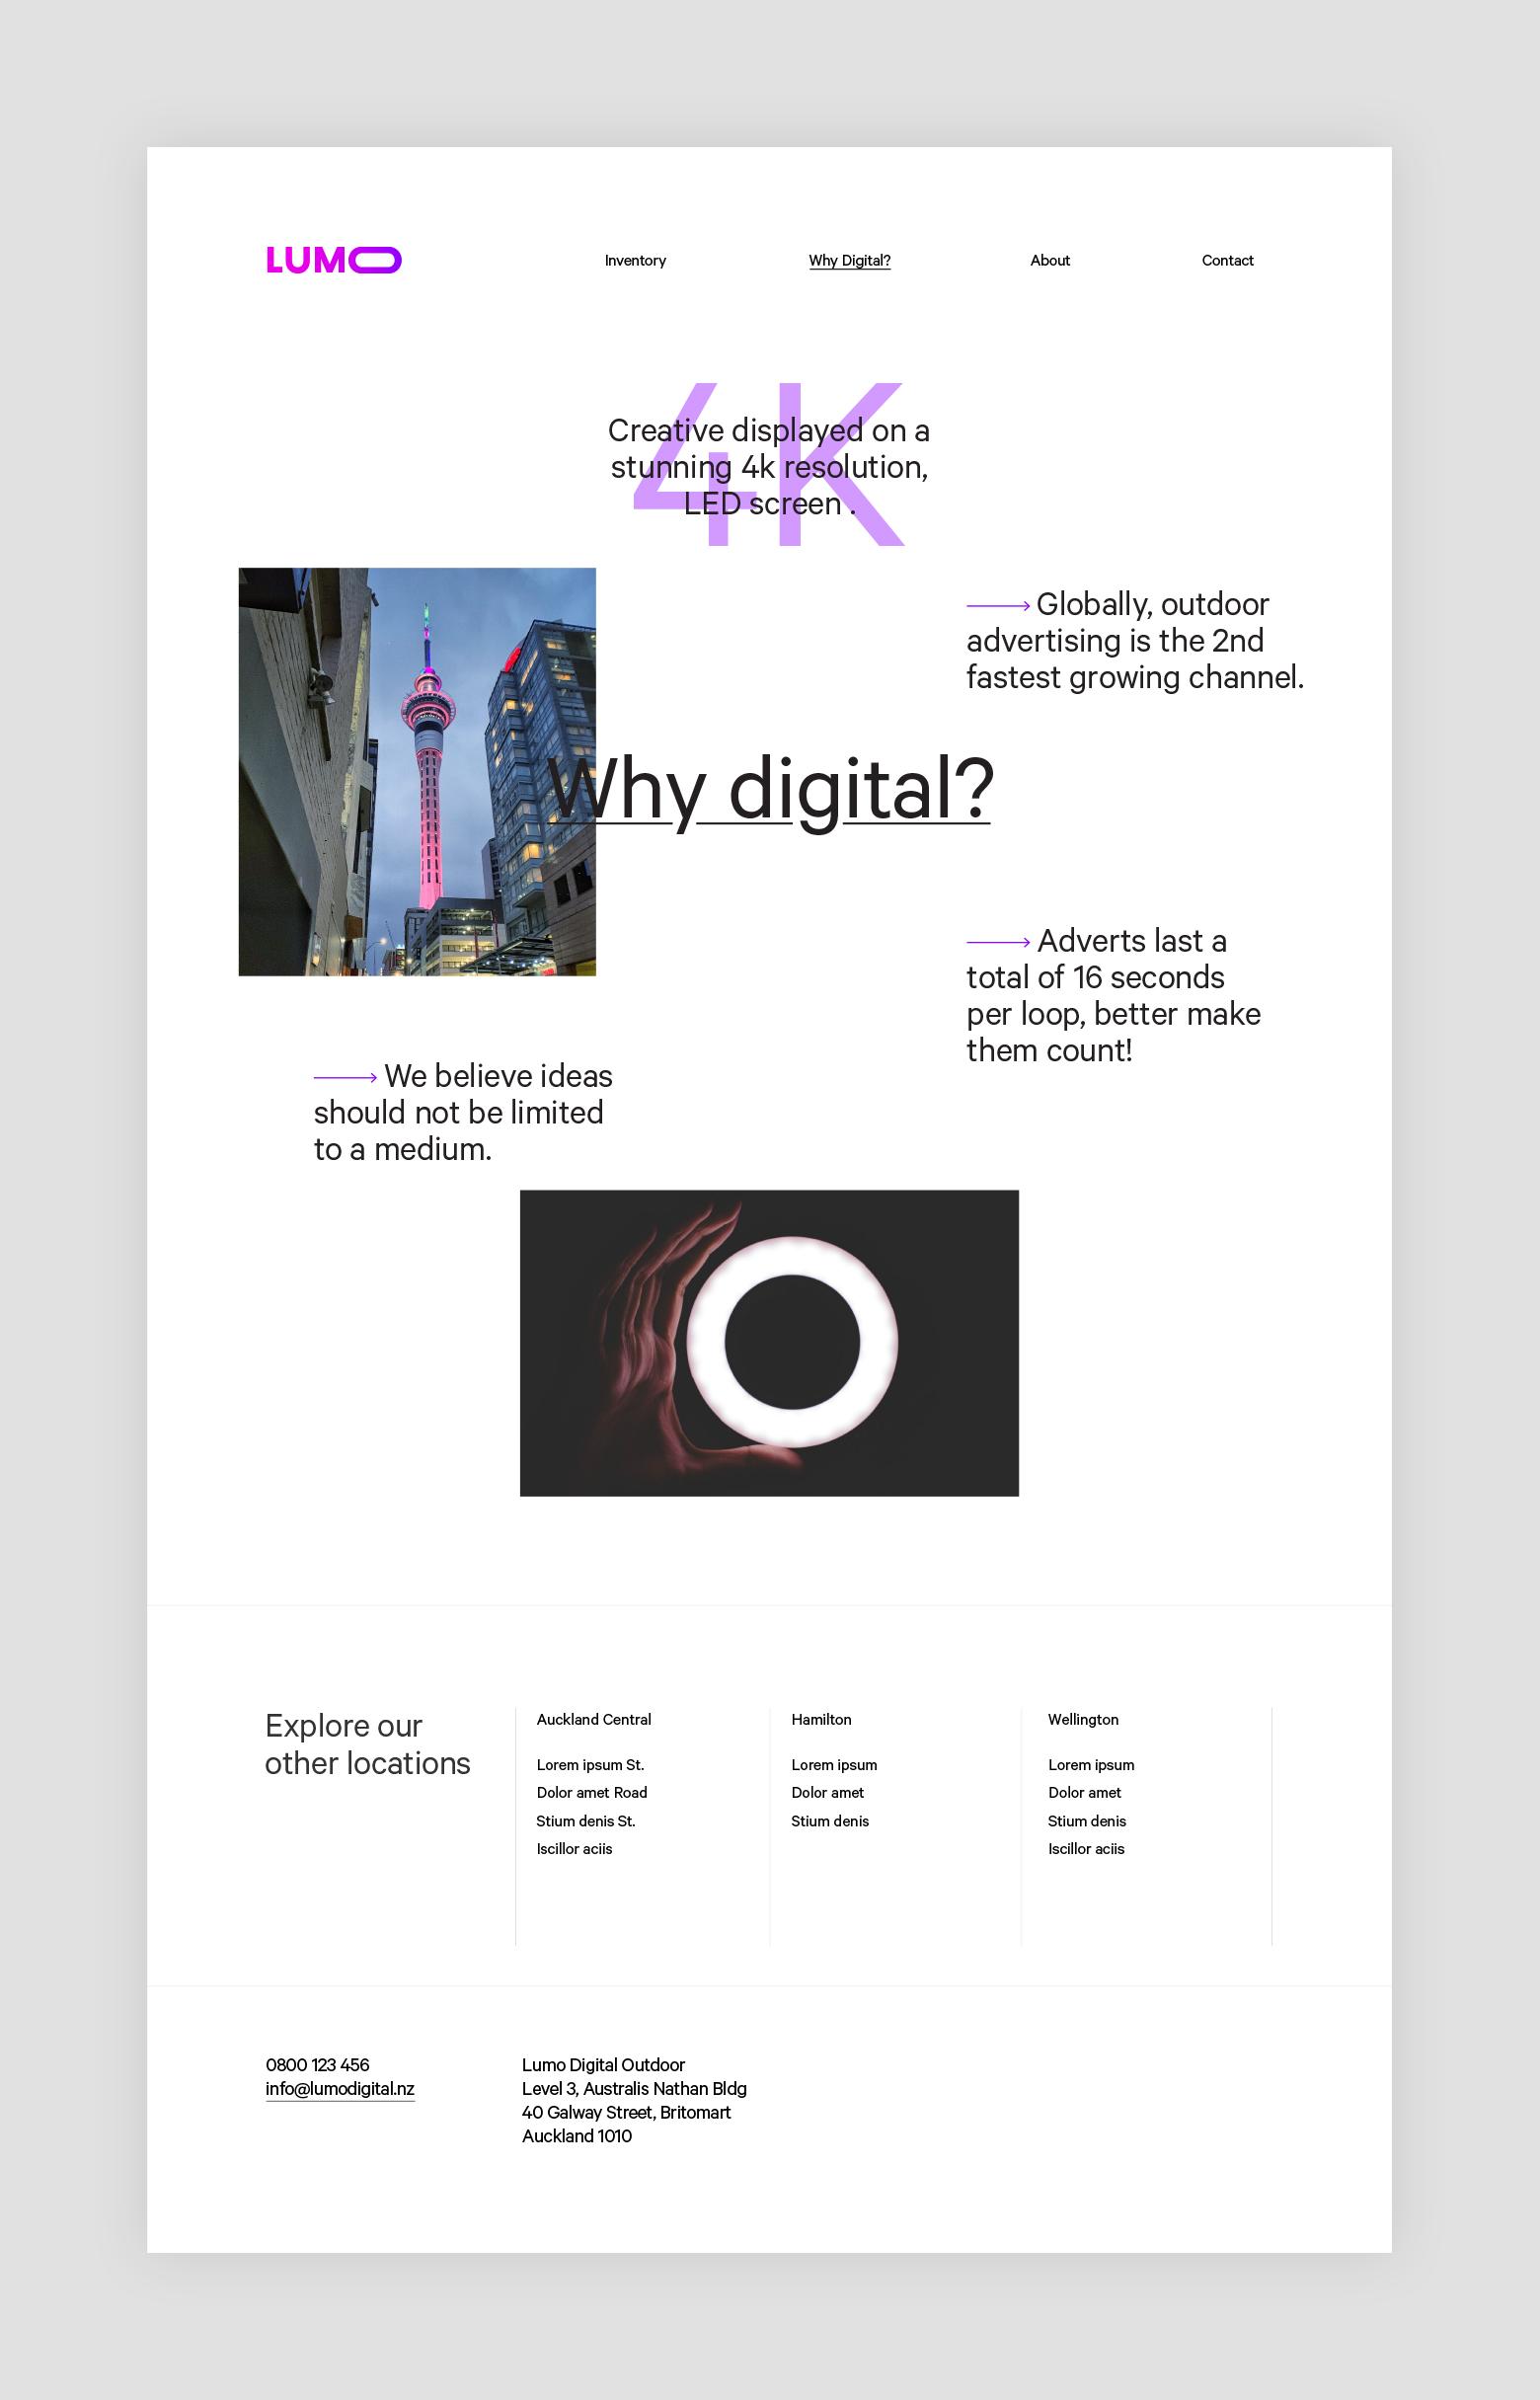 OLLIECO_Lumo-Digital-5_1560x3456